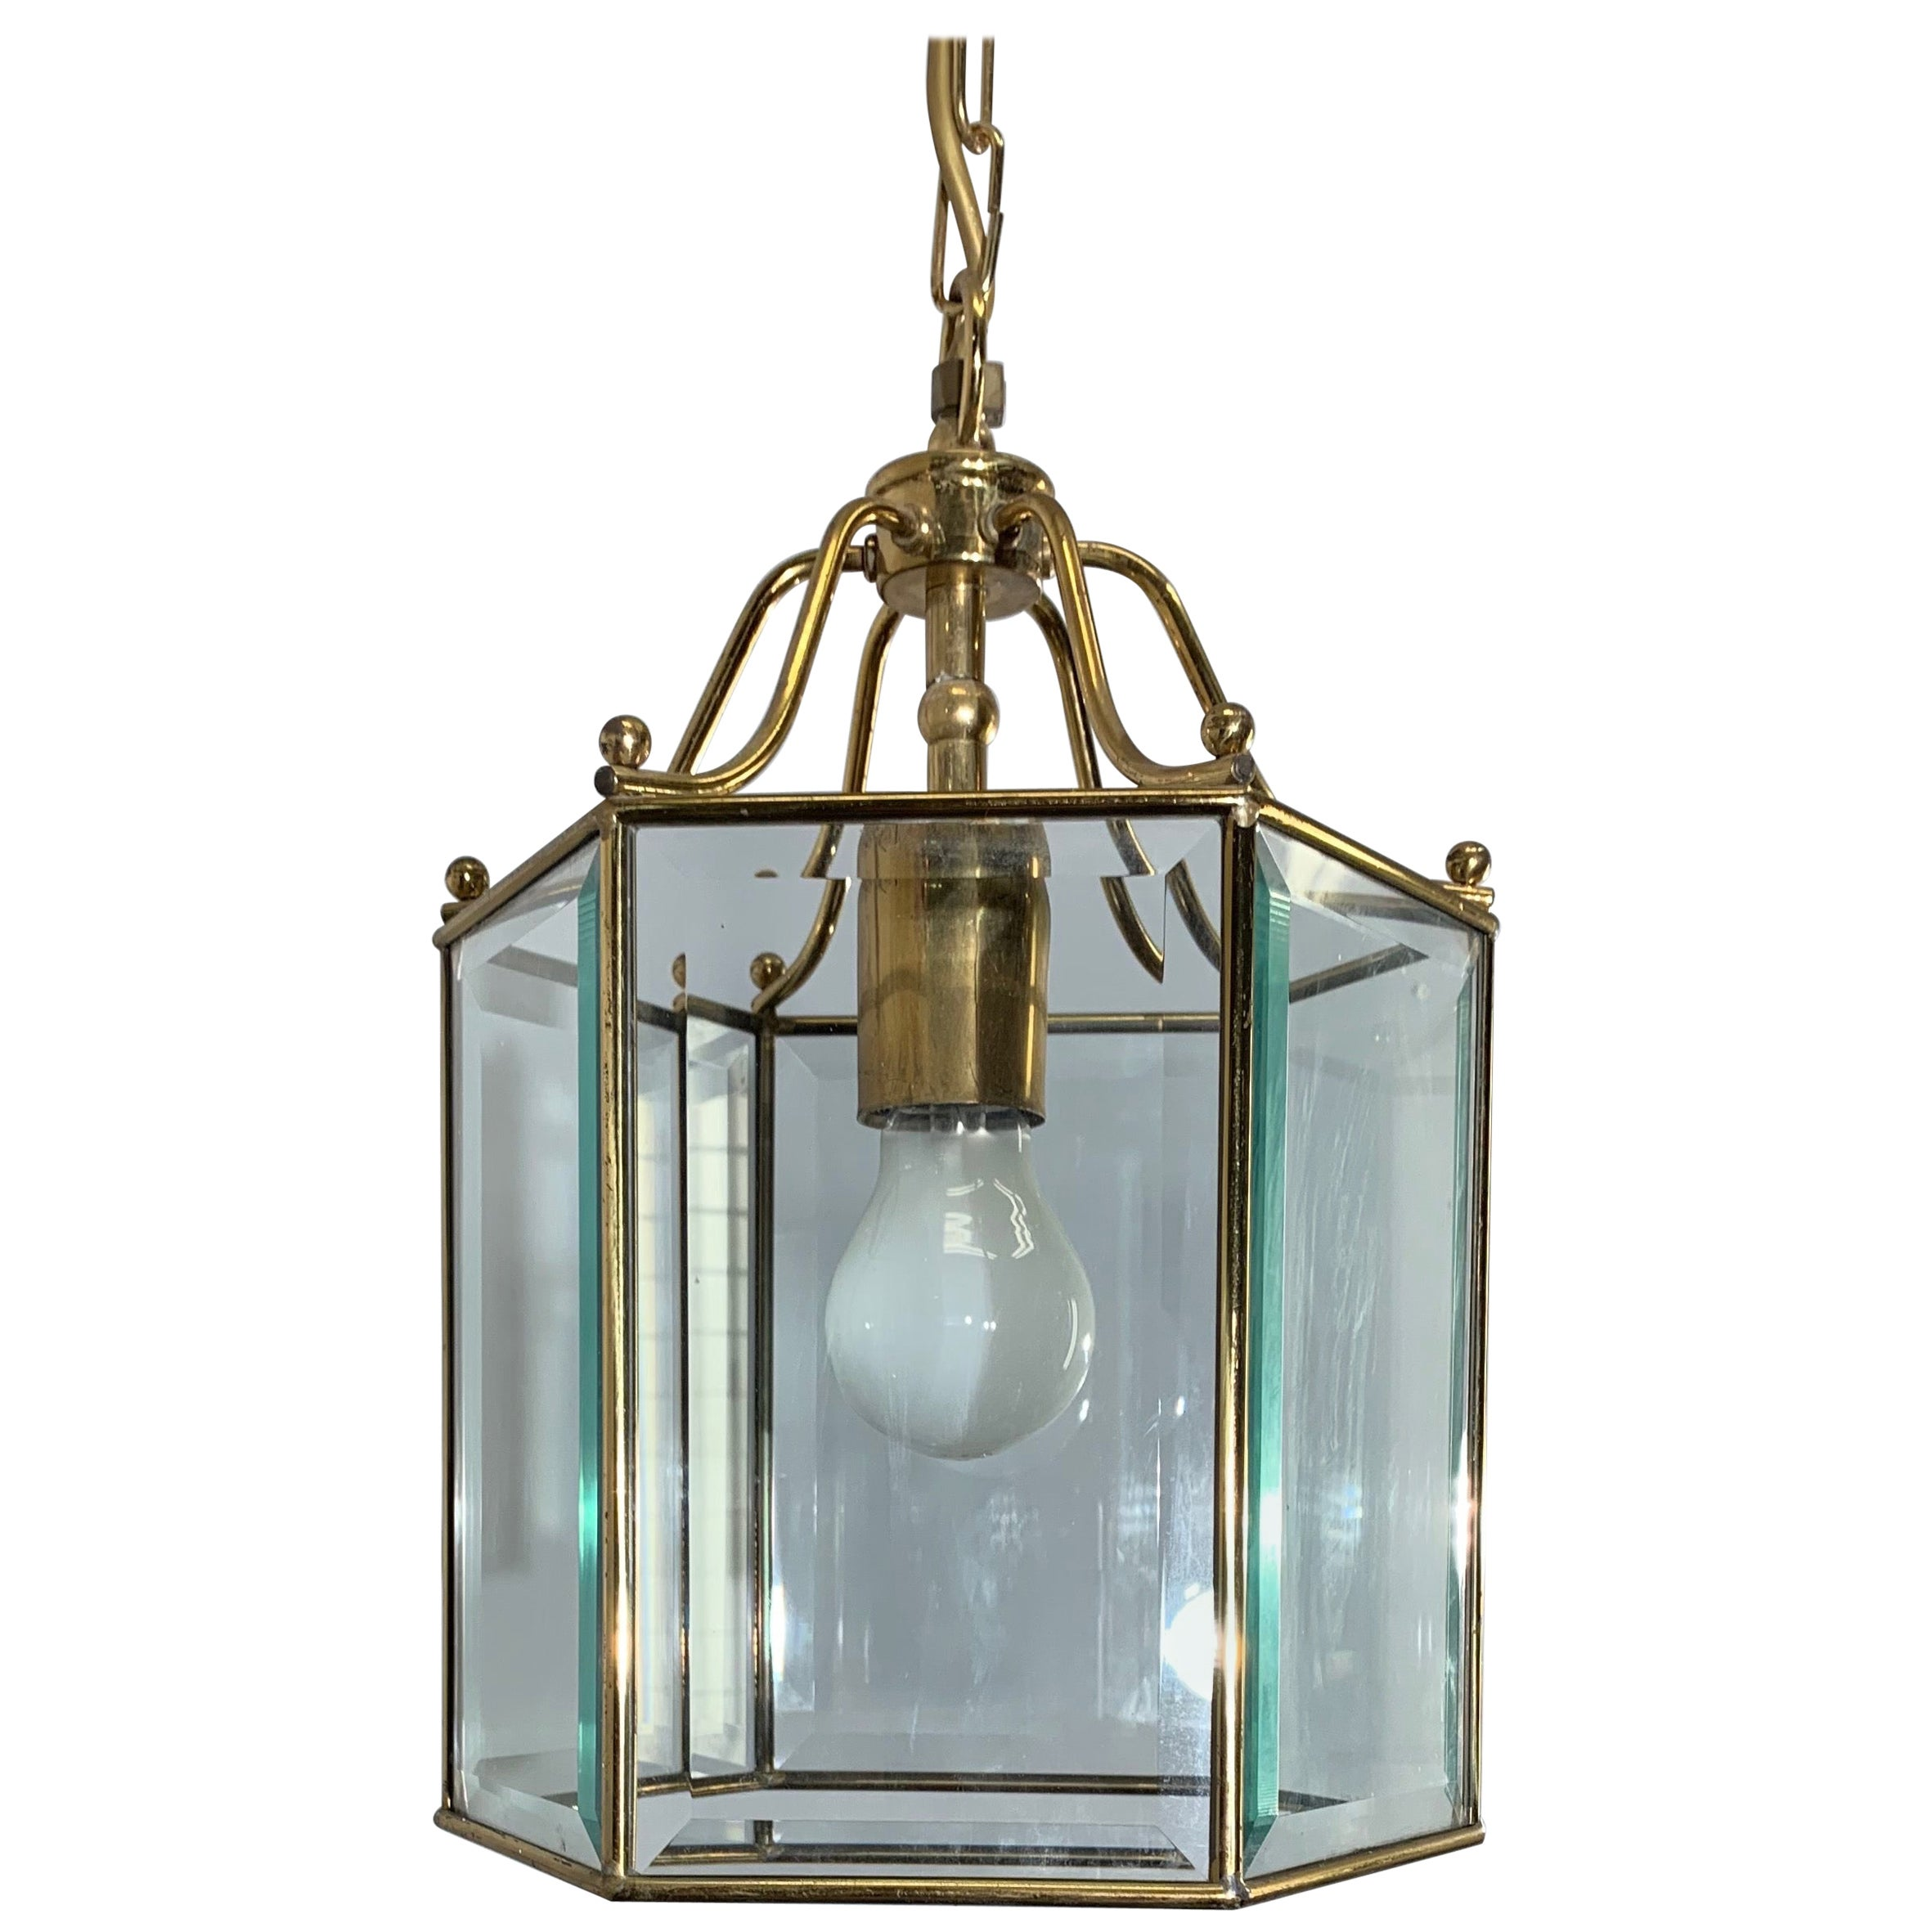 Stylish Late 20th Century Brass & Beveled Glass Hexagonal Pendant Light Fixture